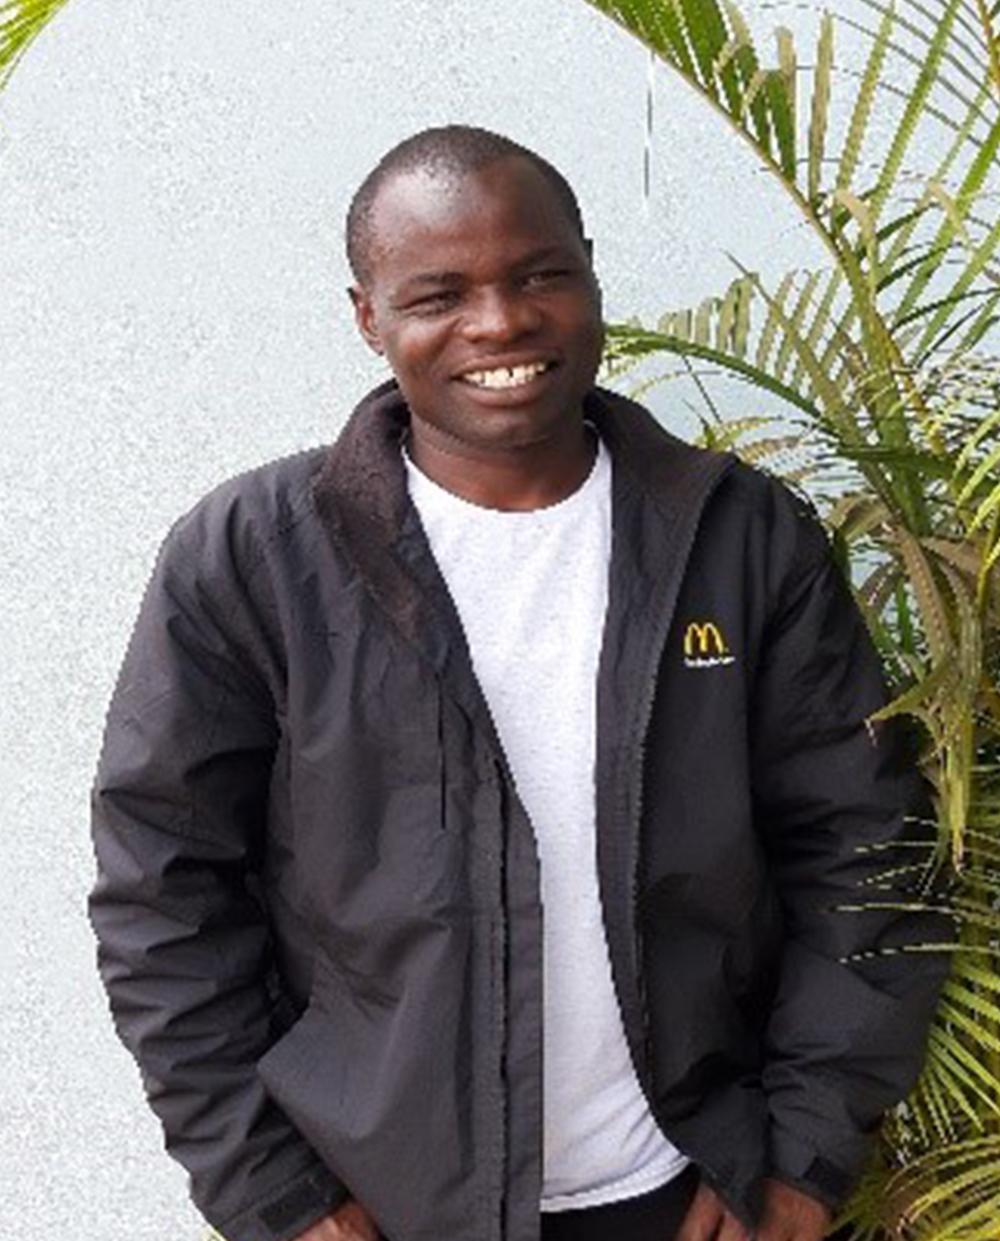 Silas Onyango